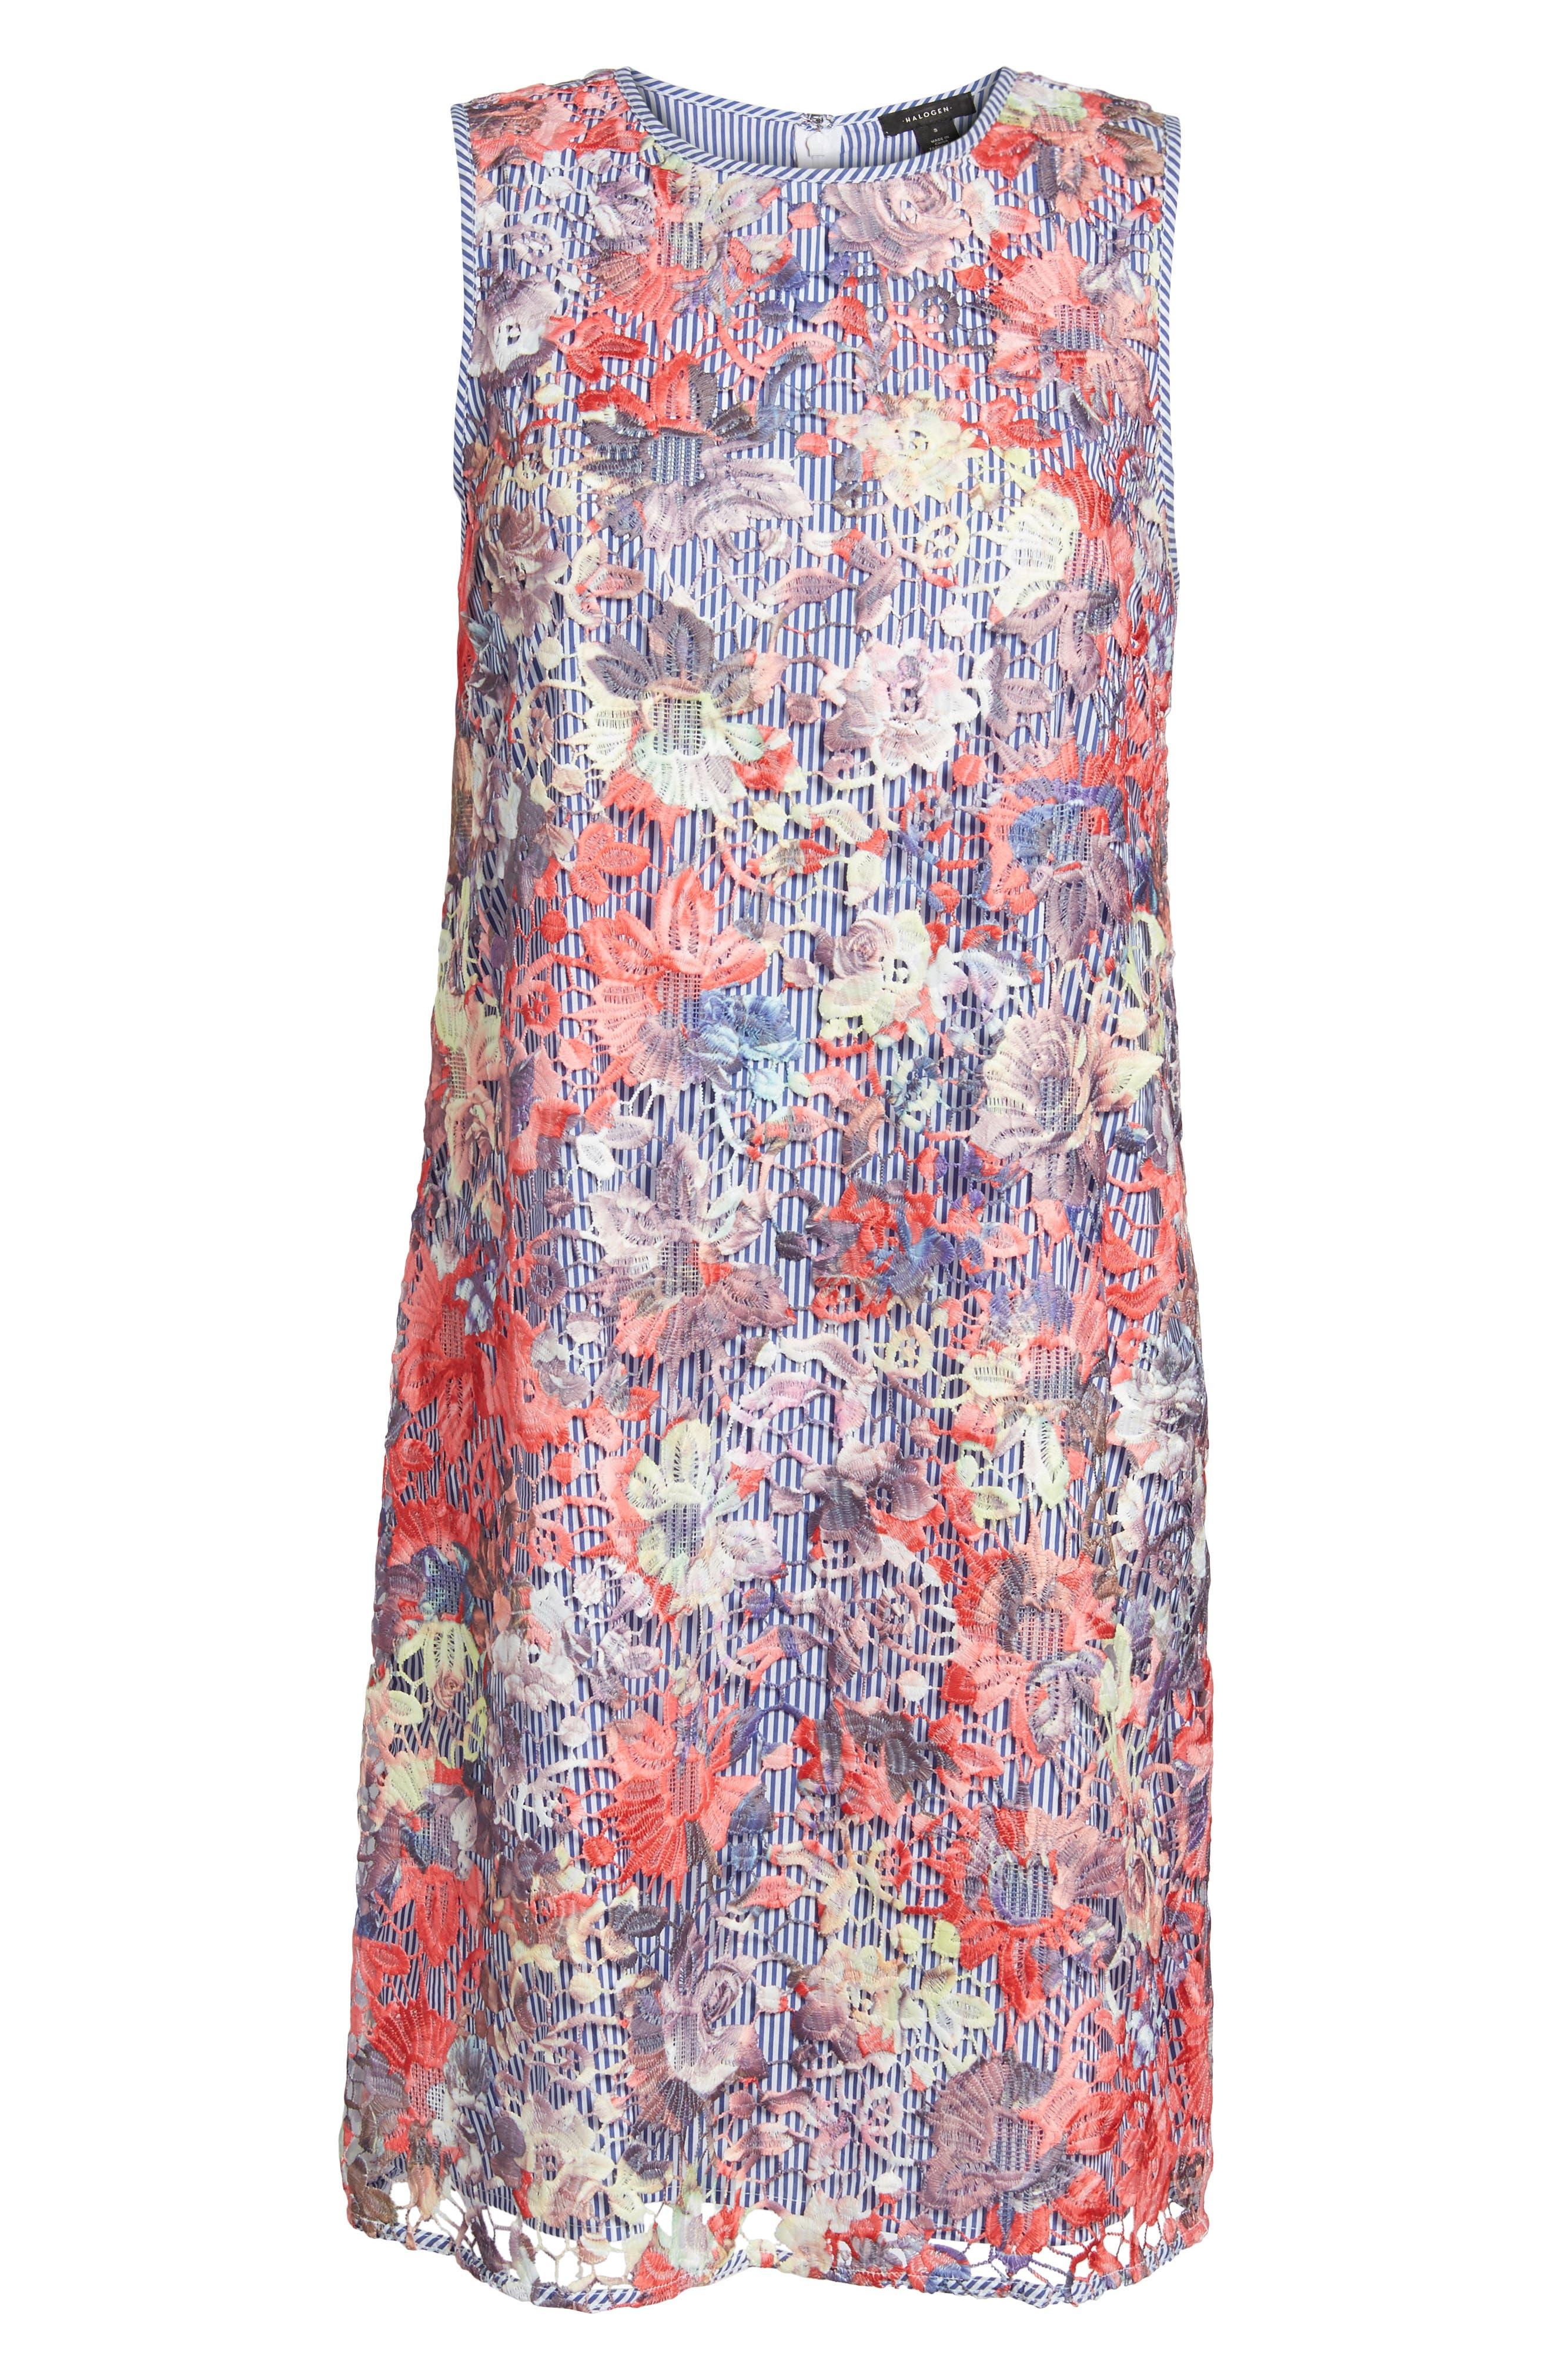 Lace Pinstripe Tank Dress,                             Alternate thumbnail 6, color,                             Coral Lace Pattern